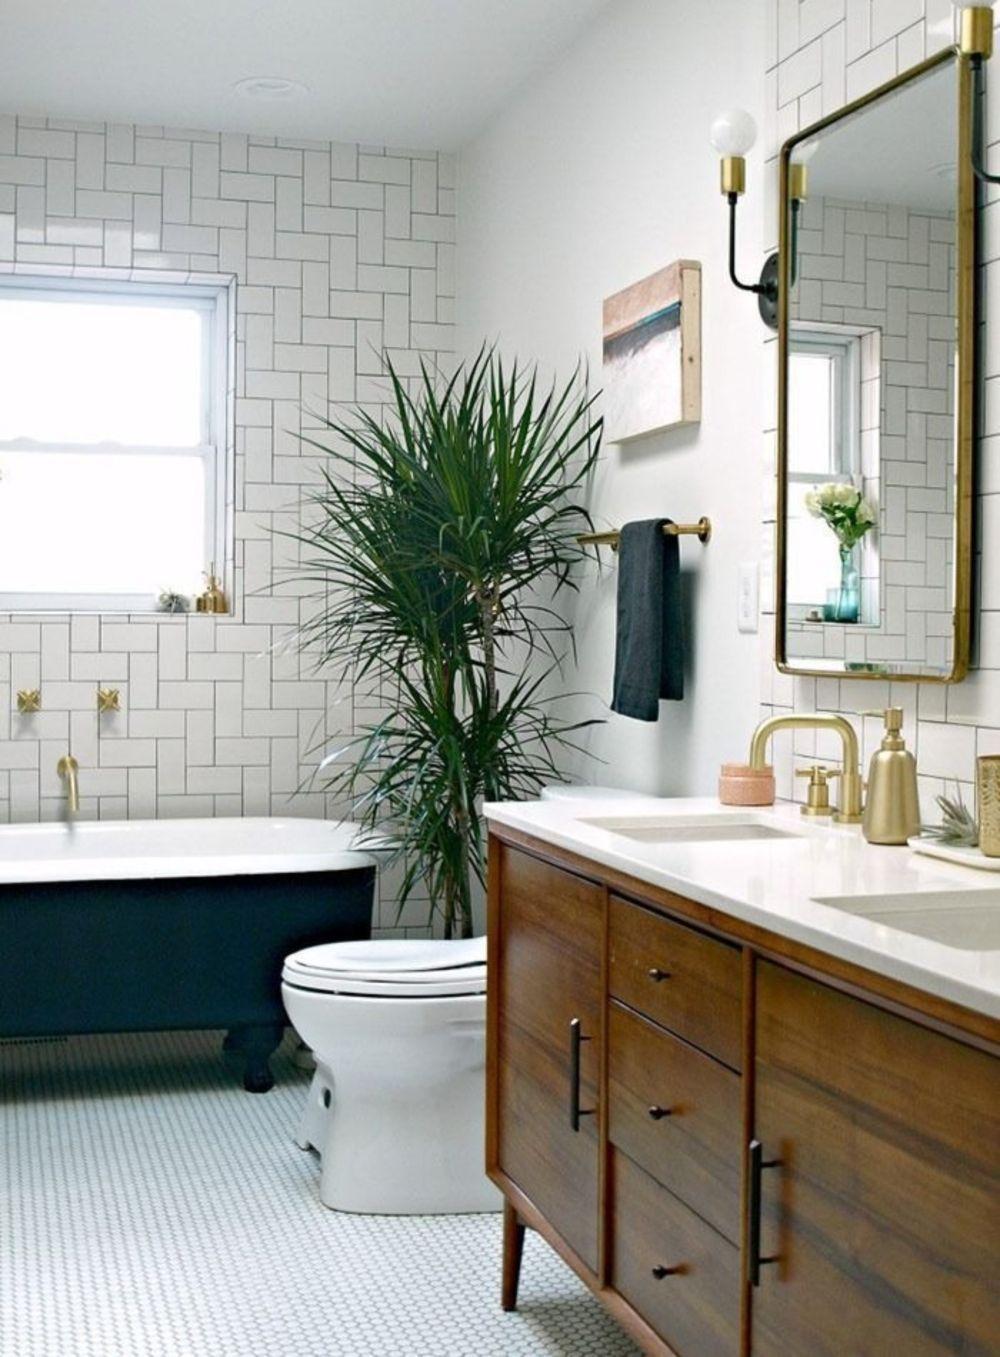 Awesome 42 Beautiful Costum Bathroom Vanity Design